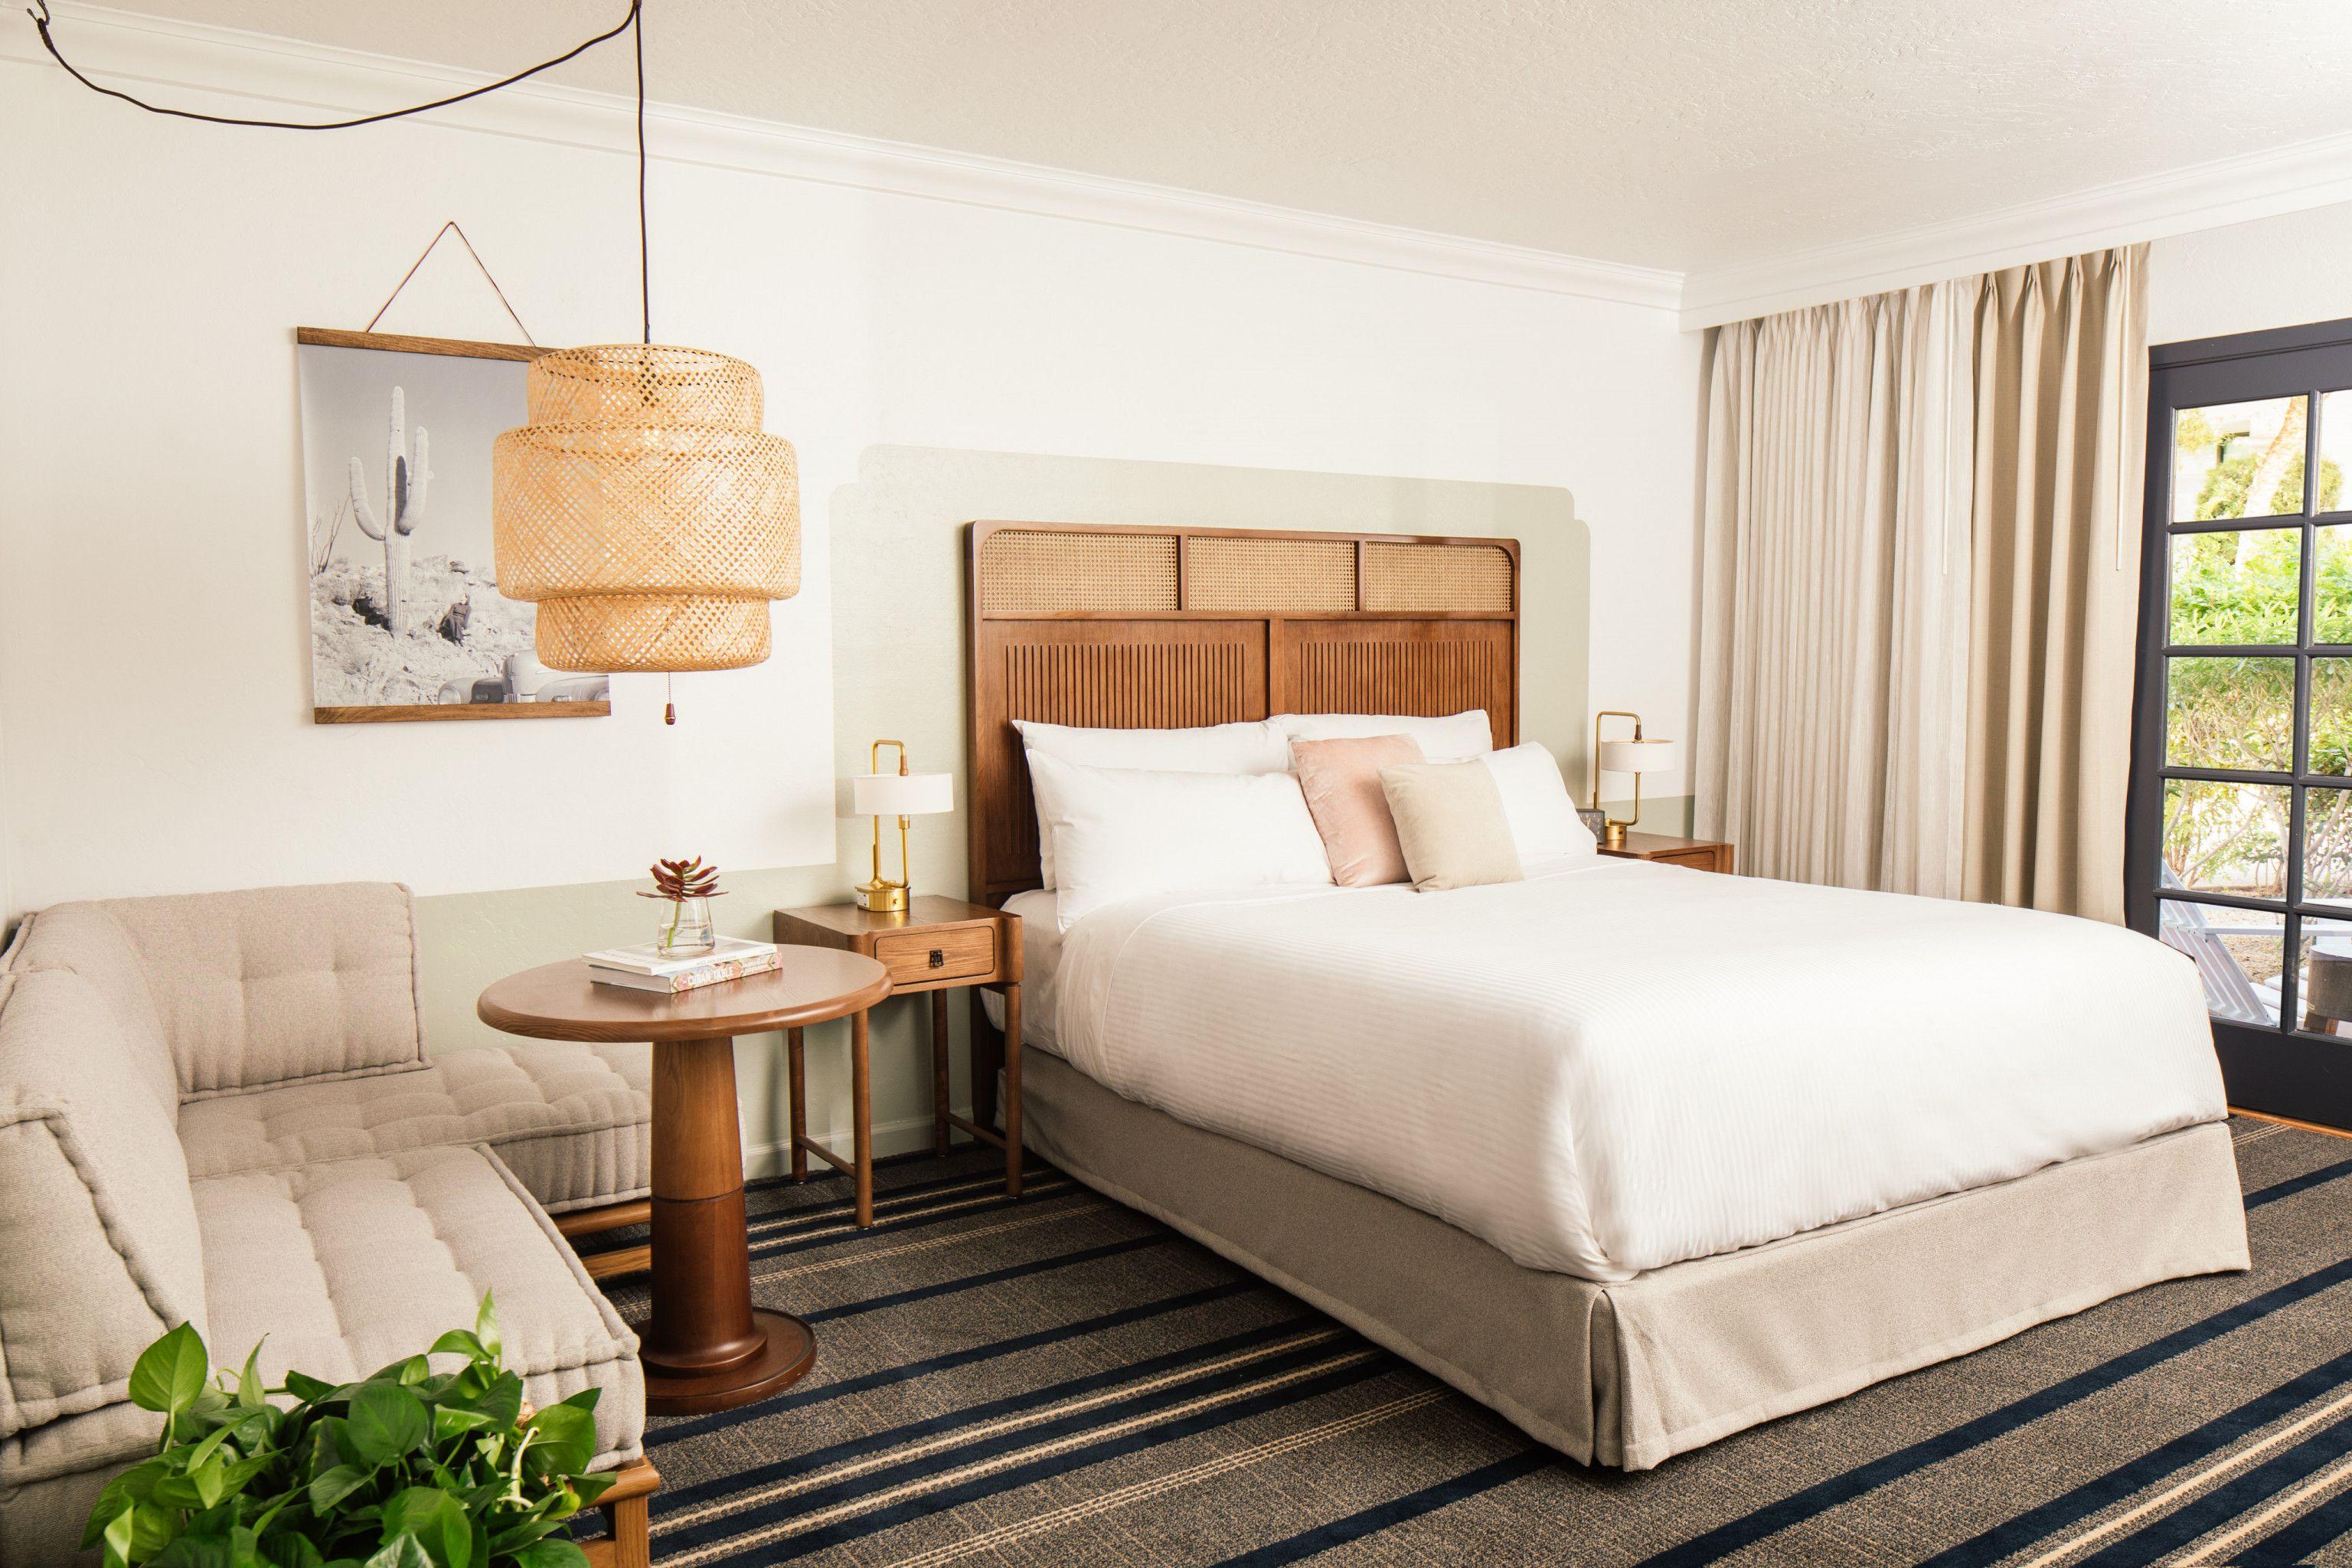 hoteldesign hoteldesigner curatedesign designlove